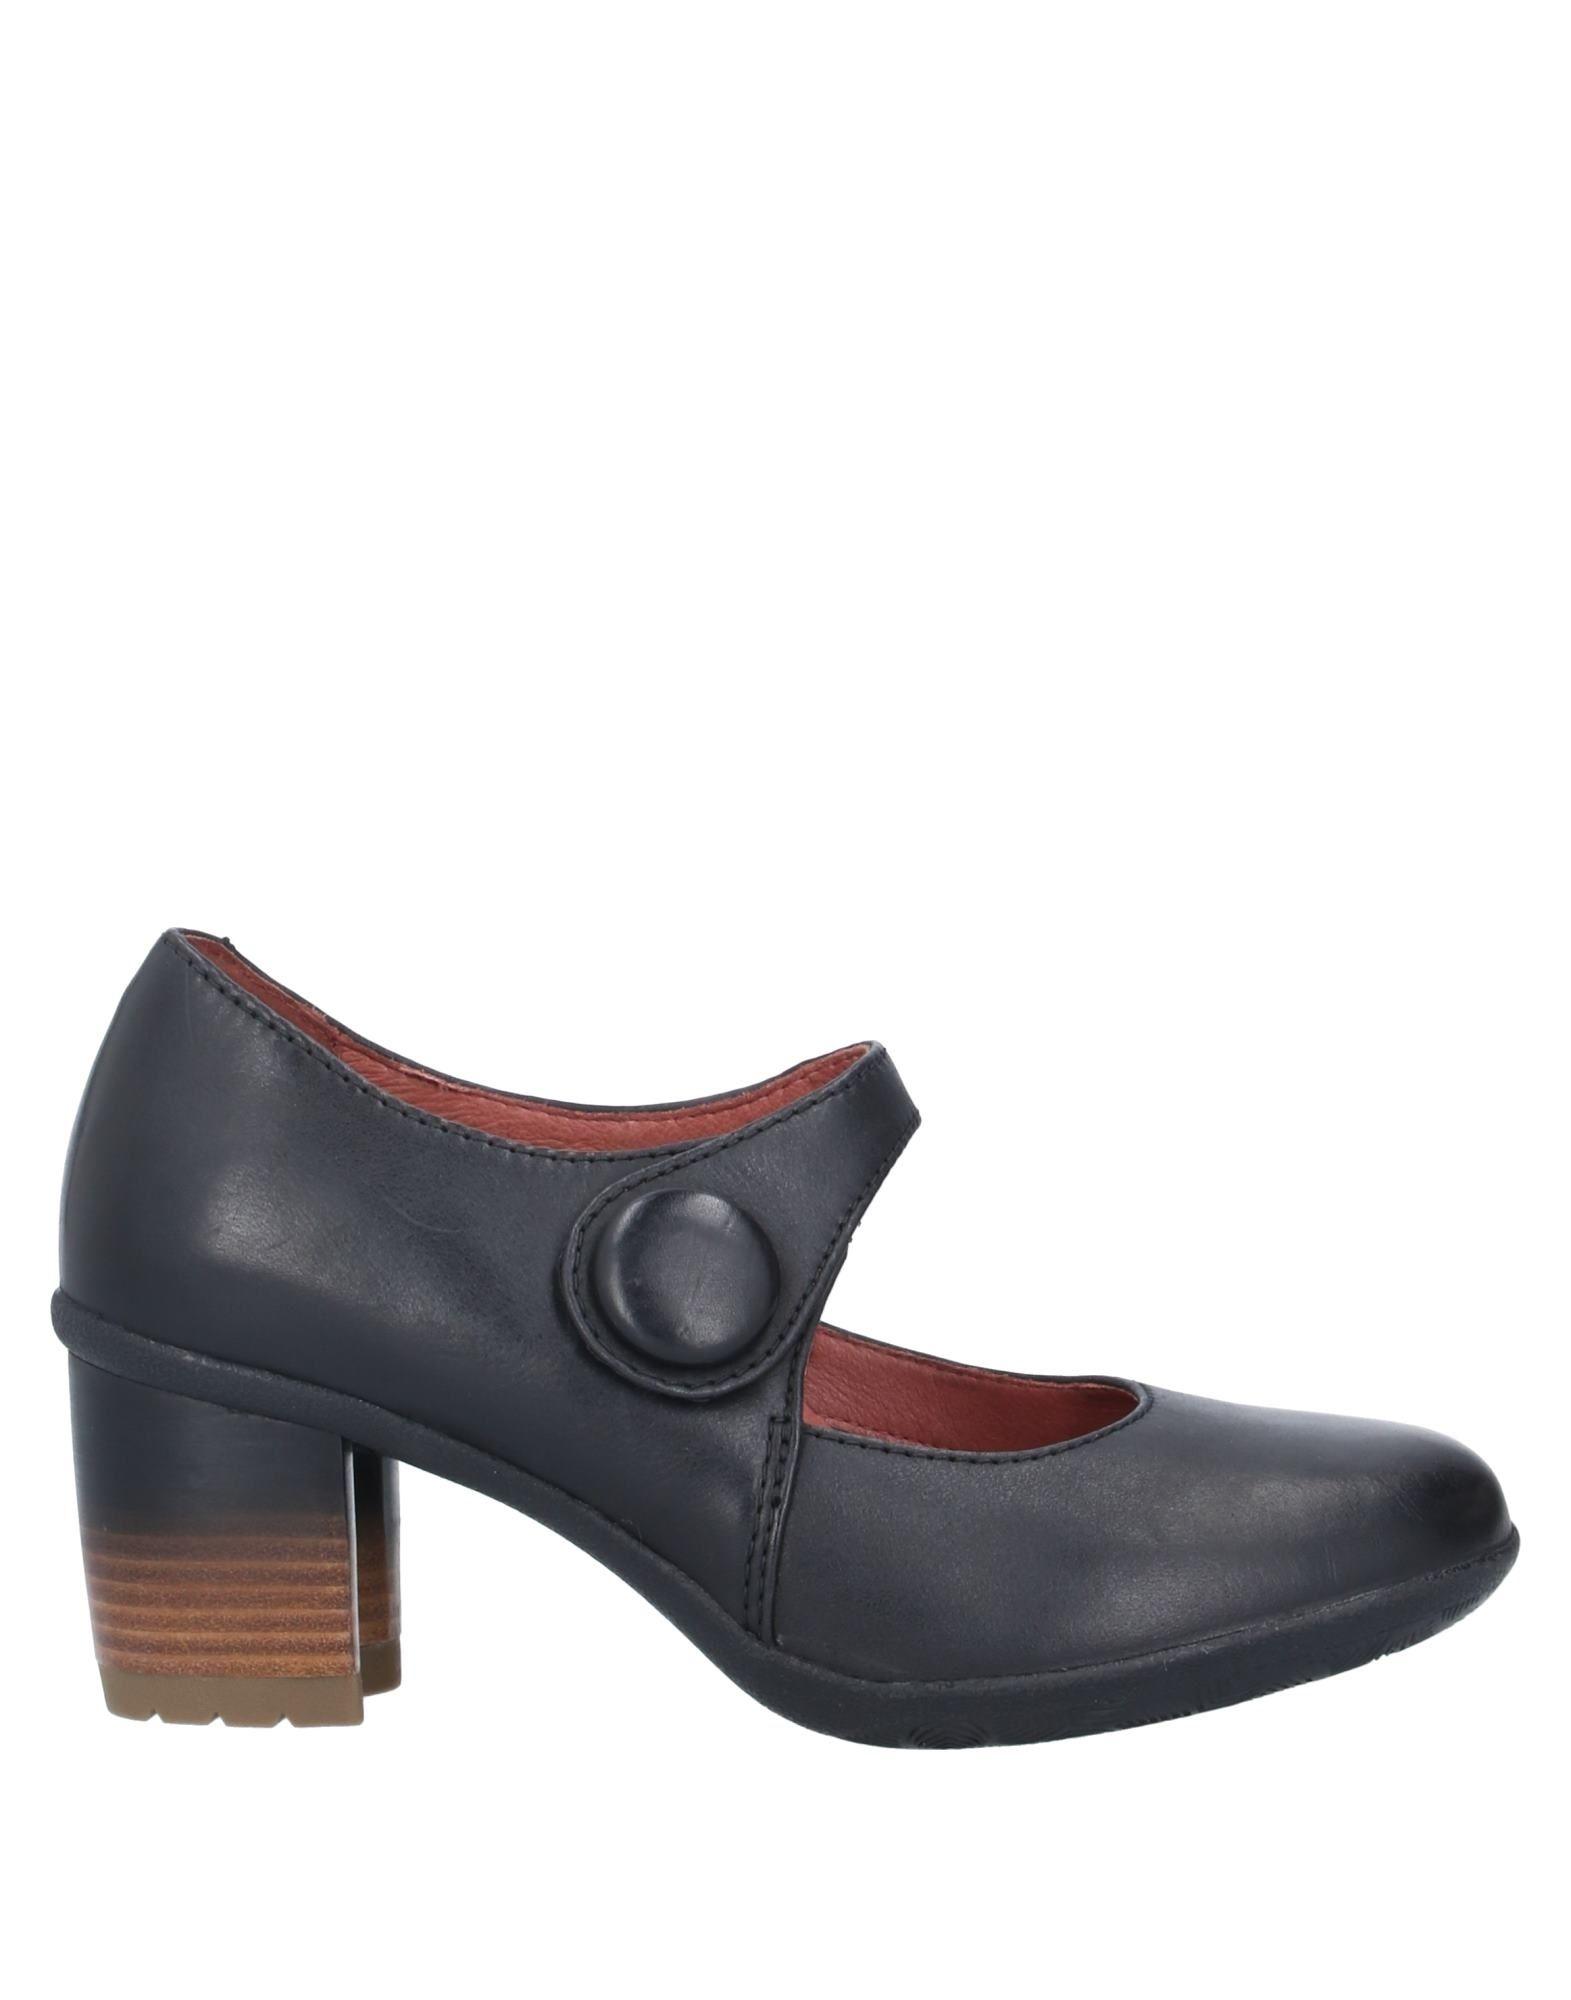 DANSKO Pumps. no appliqués, solid color, velcro closure, round toeline, square heel, leather lining, rubber sole, contains non-textile parts of animal origin. Soft Leather